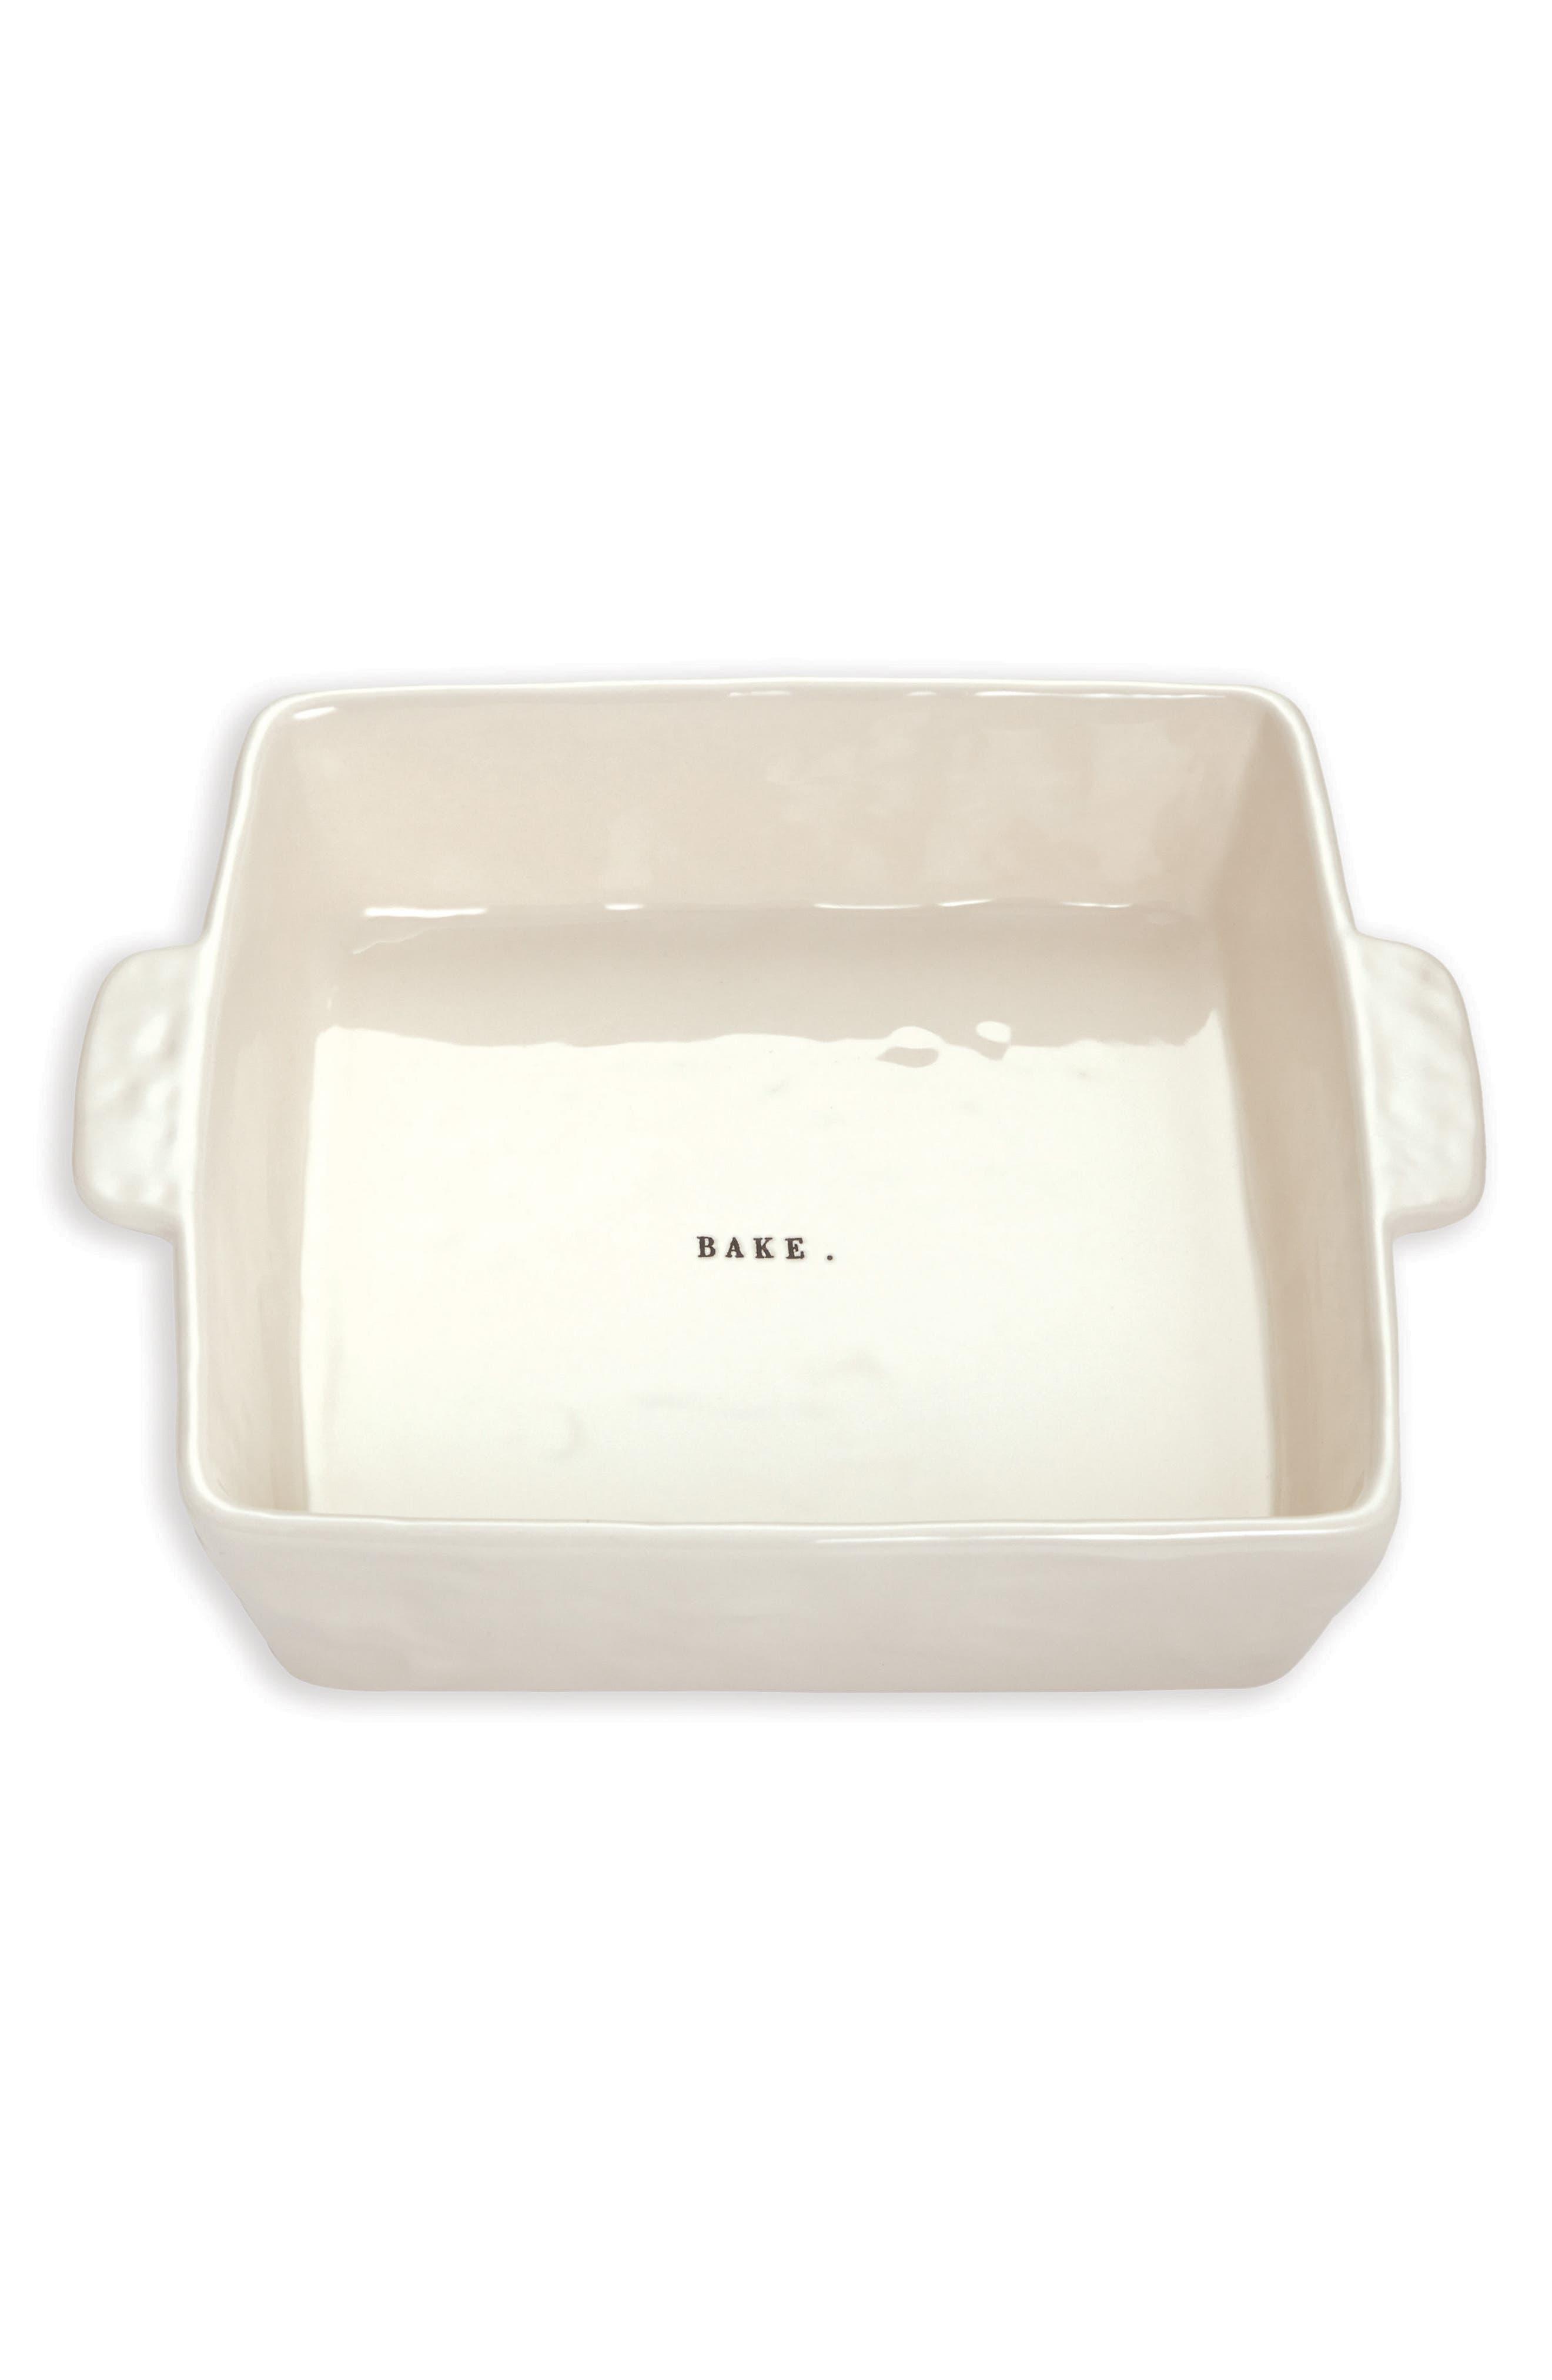 Ceramic Bake Dish,                             Main thumbnail 1, color,                             100